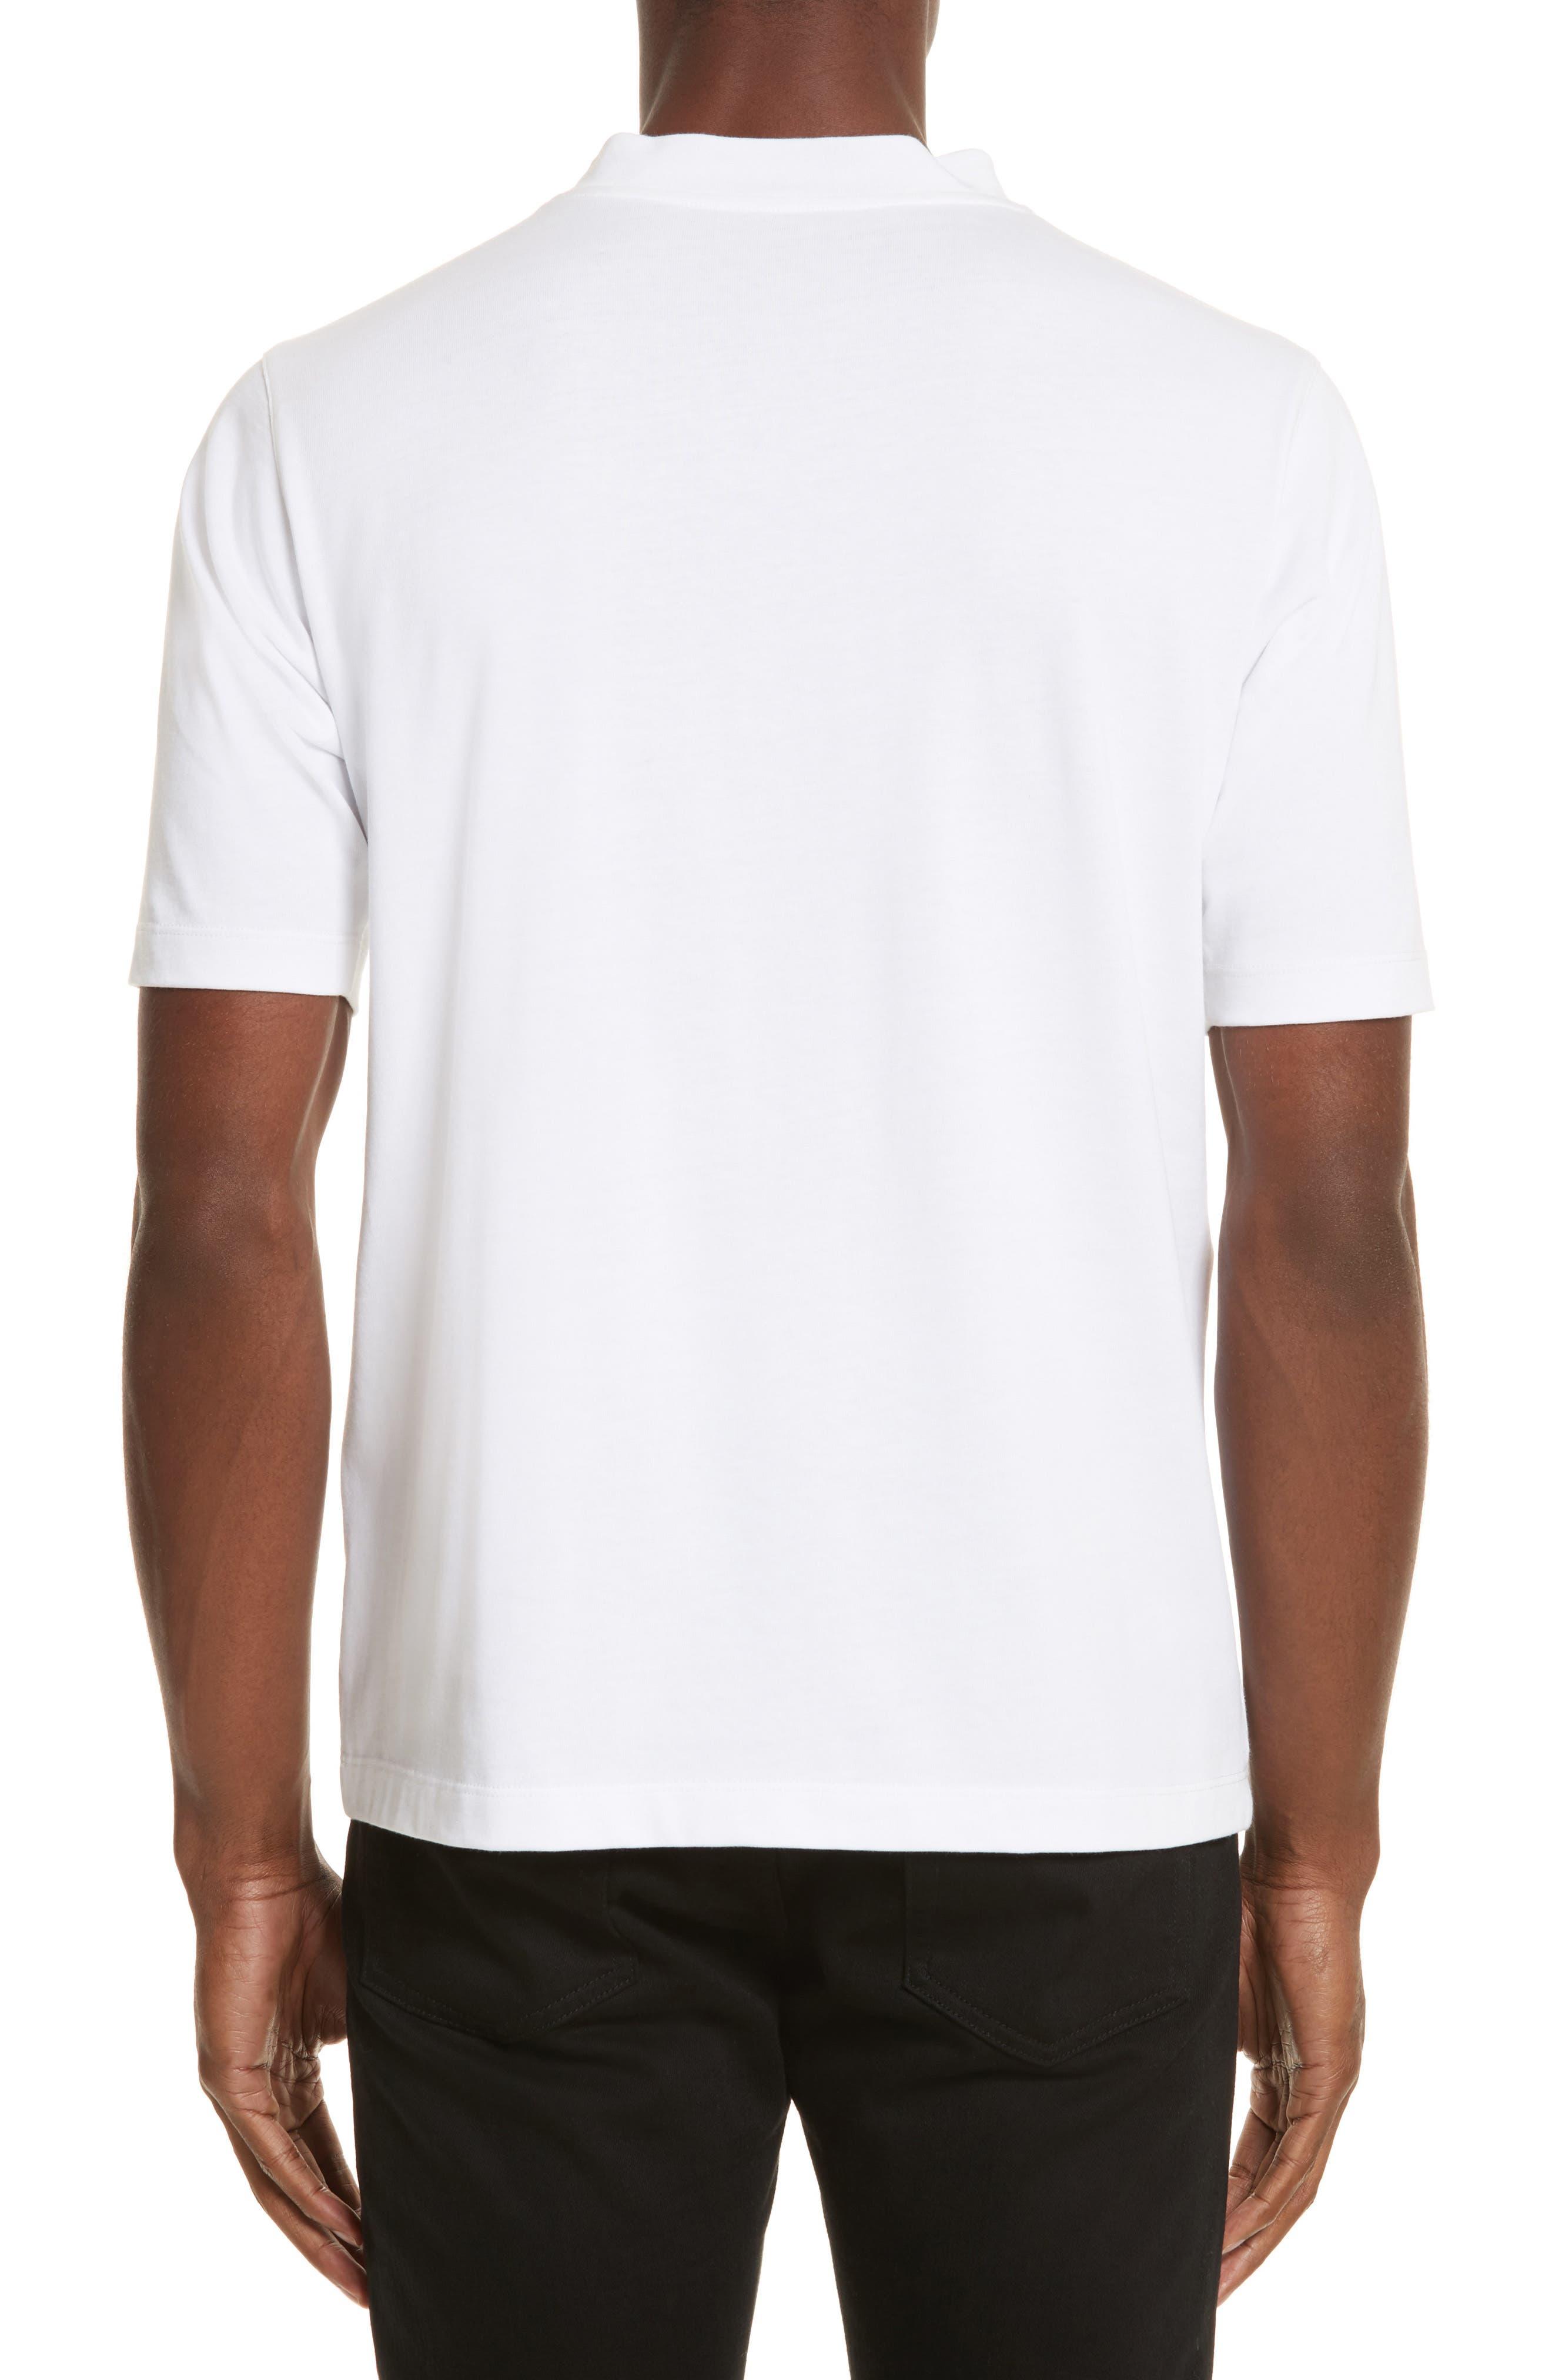 Austria Tall T-Shirt,                             Alternate thumbnail 2, color,                             100